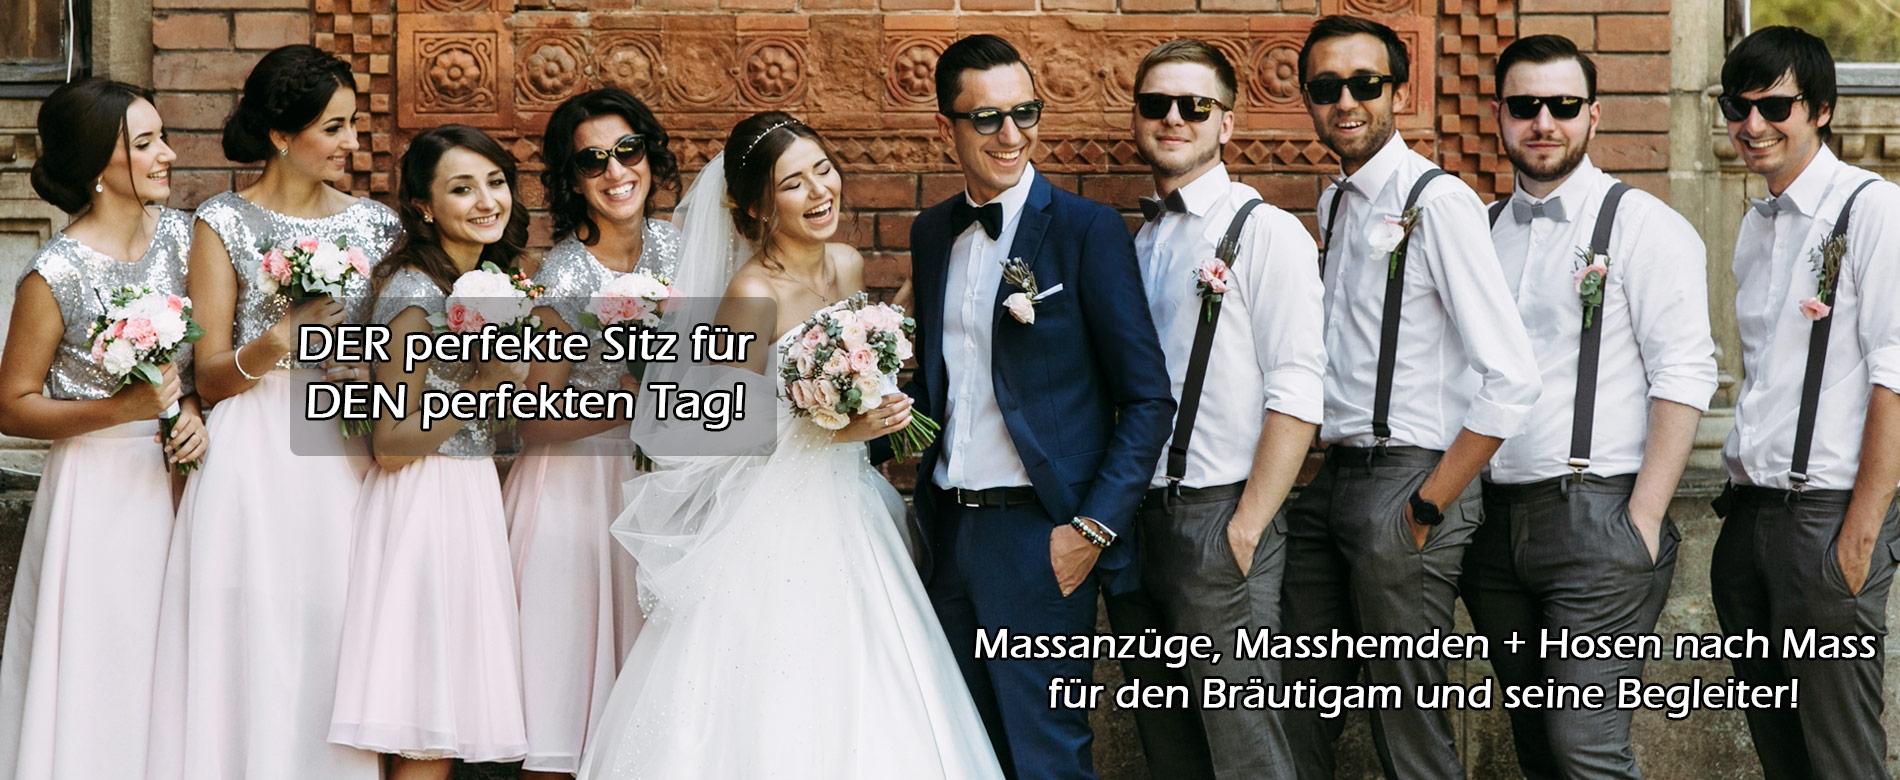 Massanzug-online (@massanzugonline) Cover Image